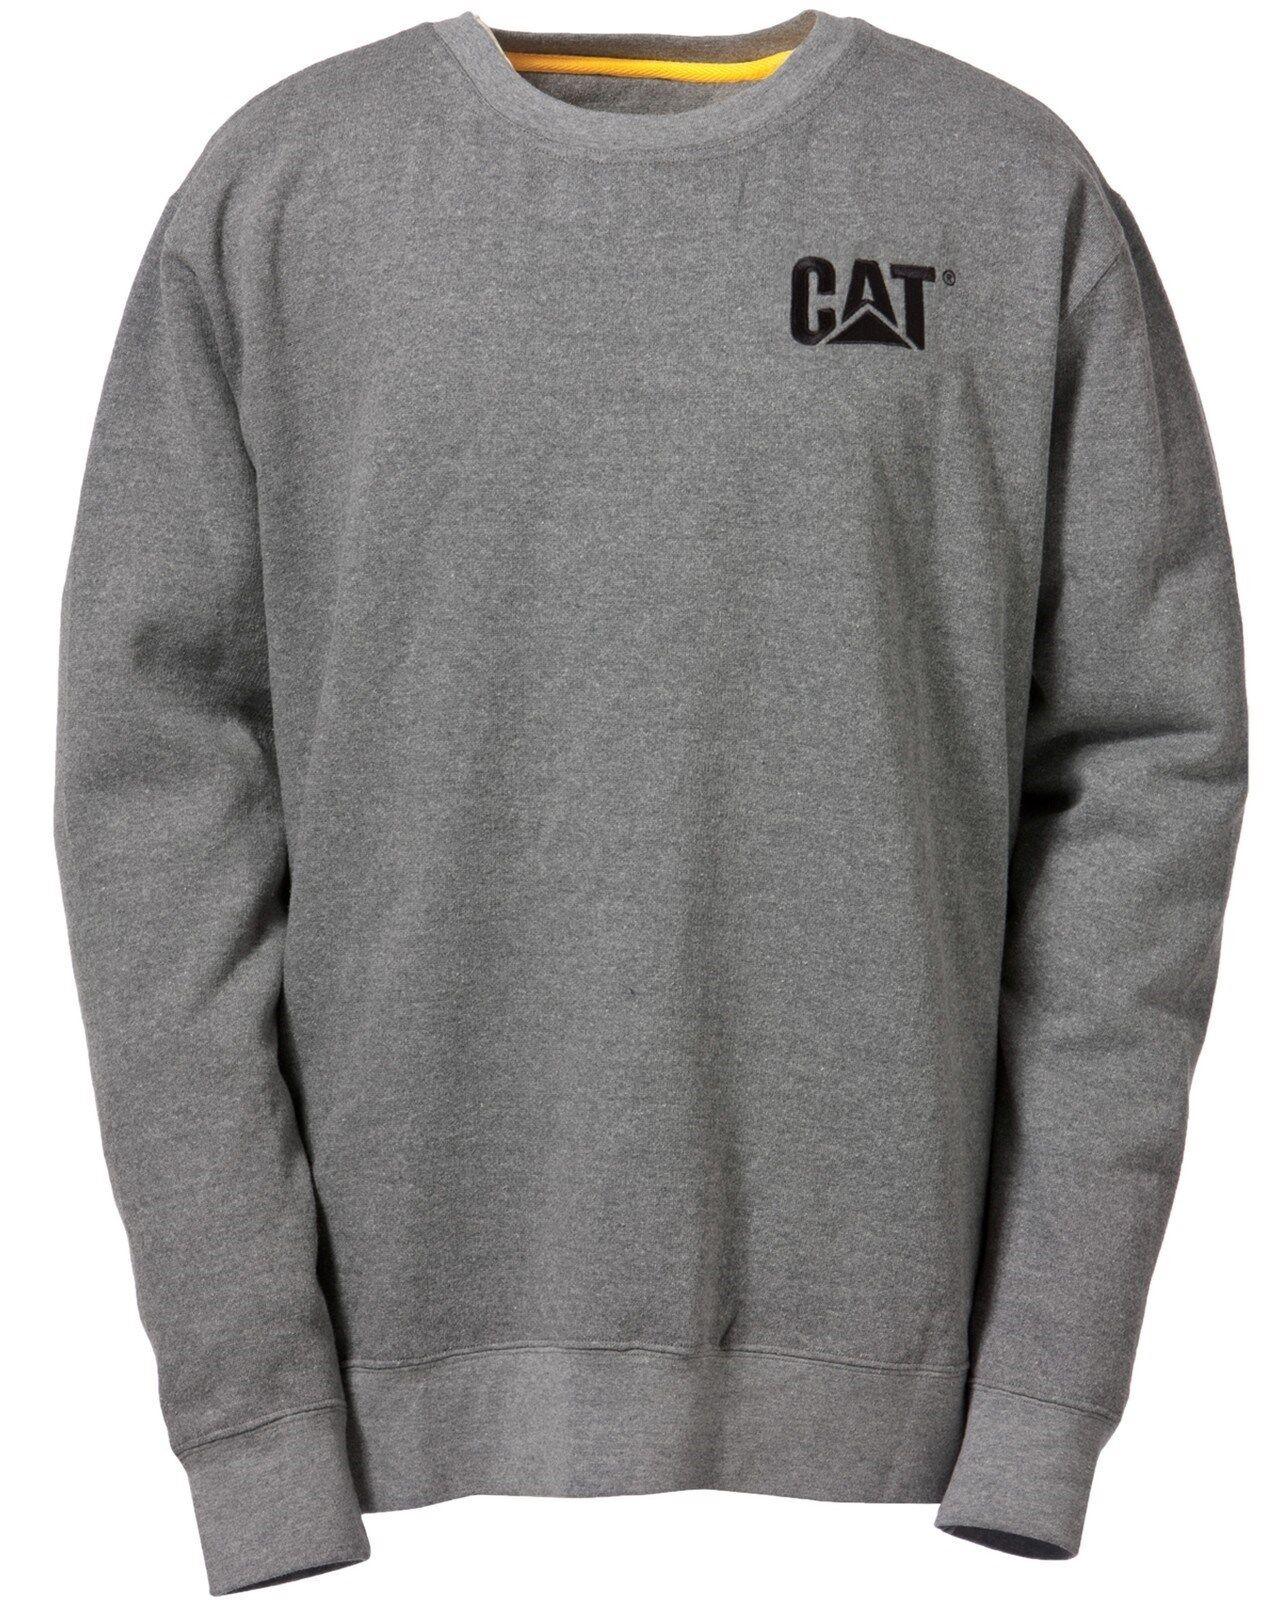 Cat Caterpillar Marque Déposée Sweat-Shirt Col Rond Rond Col Hommes Durable Travail Pull cd3662